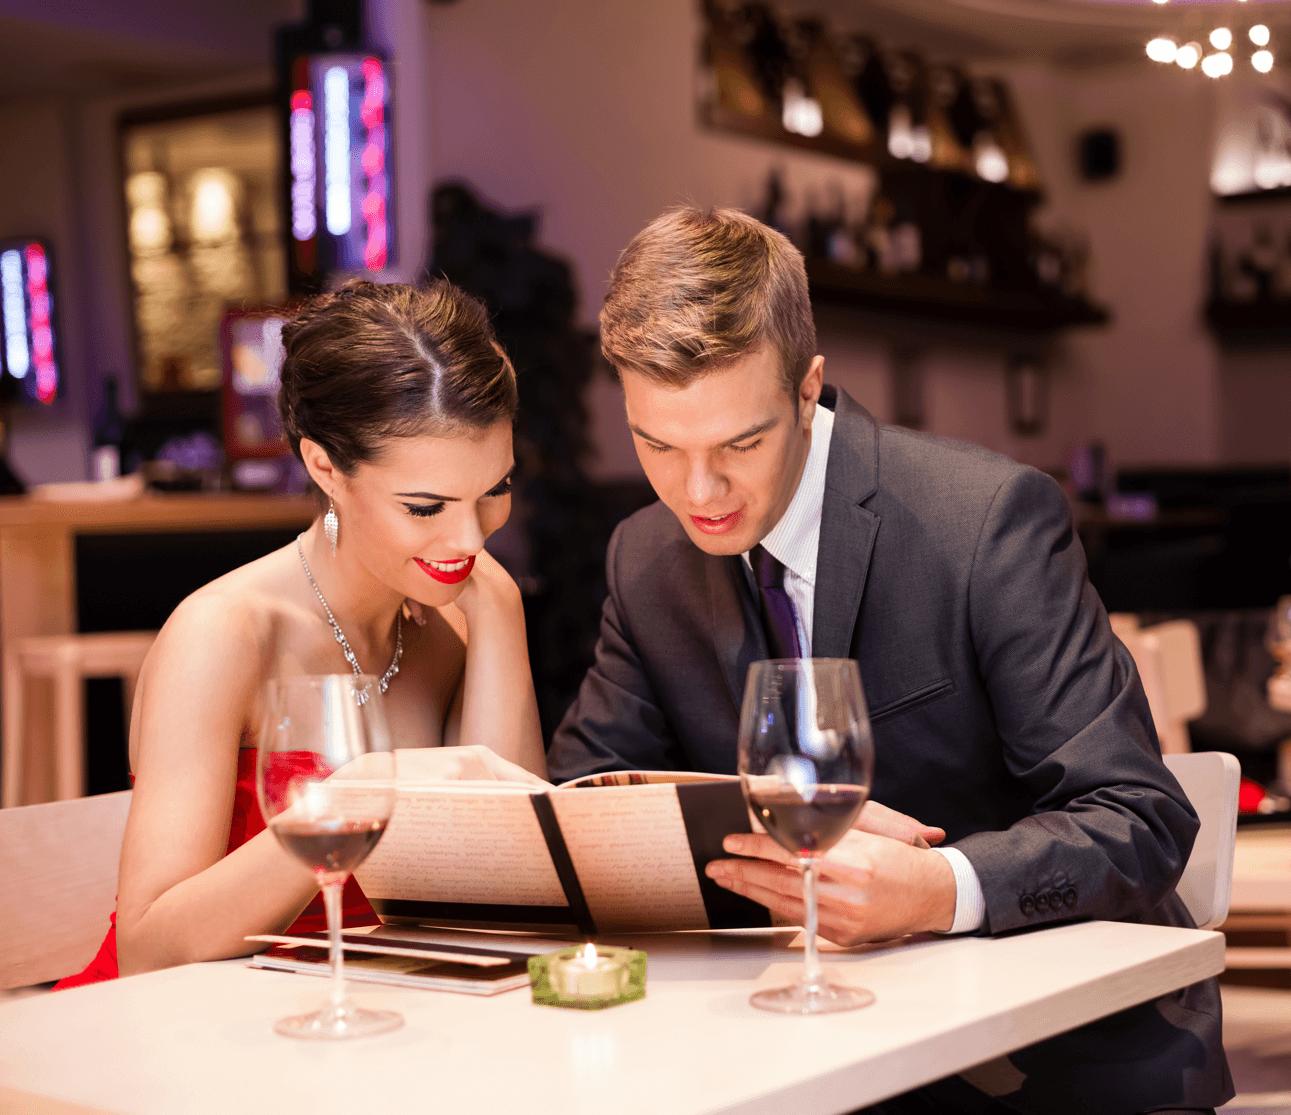 Calgary's Best Spots for Valentine's Day Dinner Menu Image